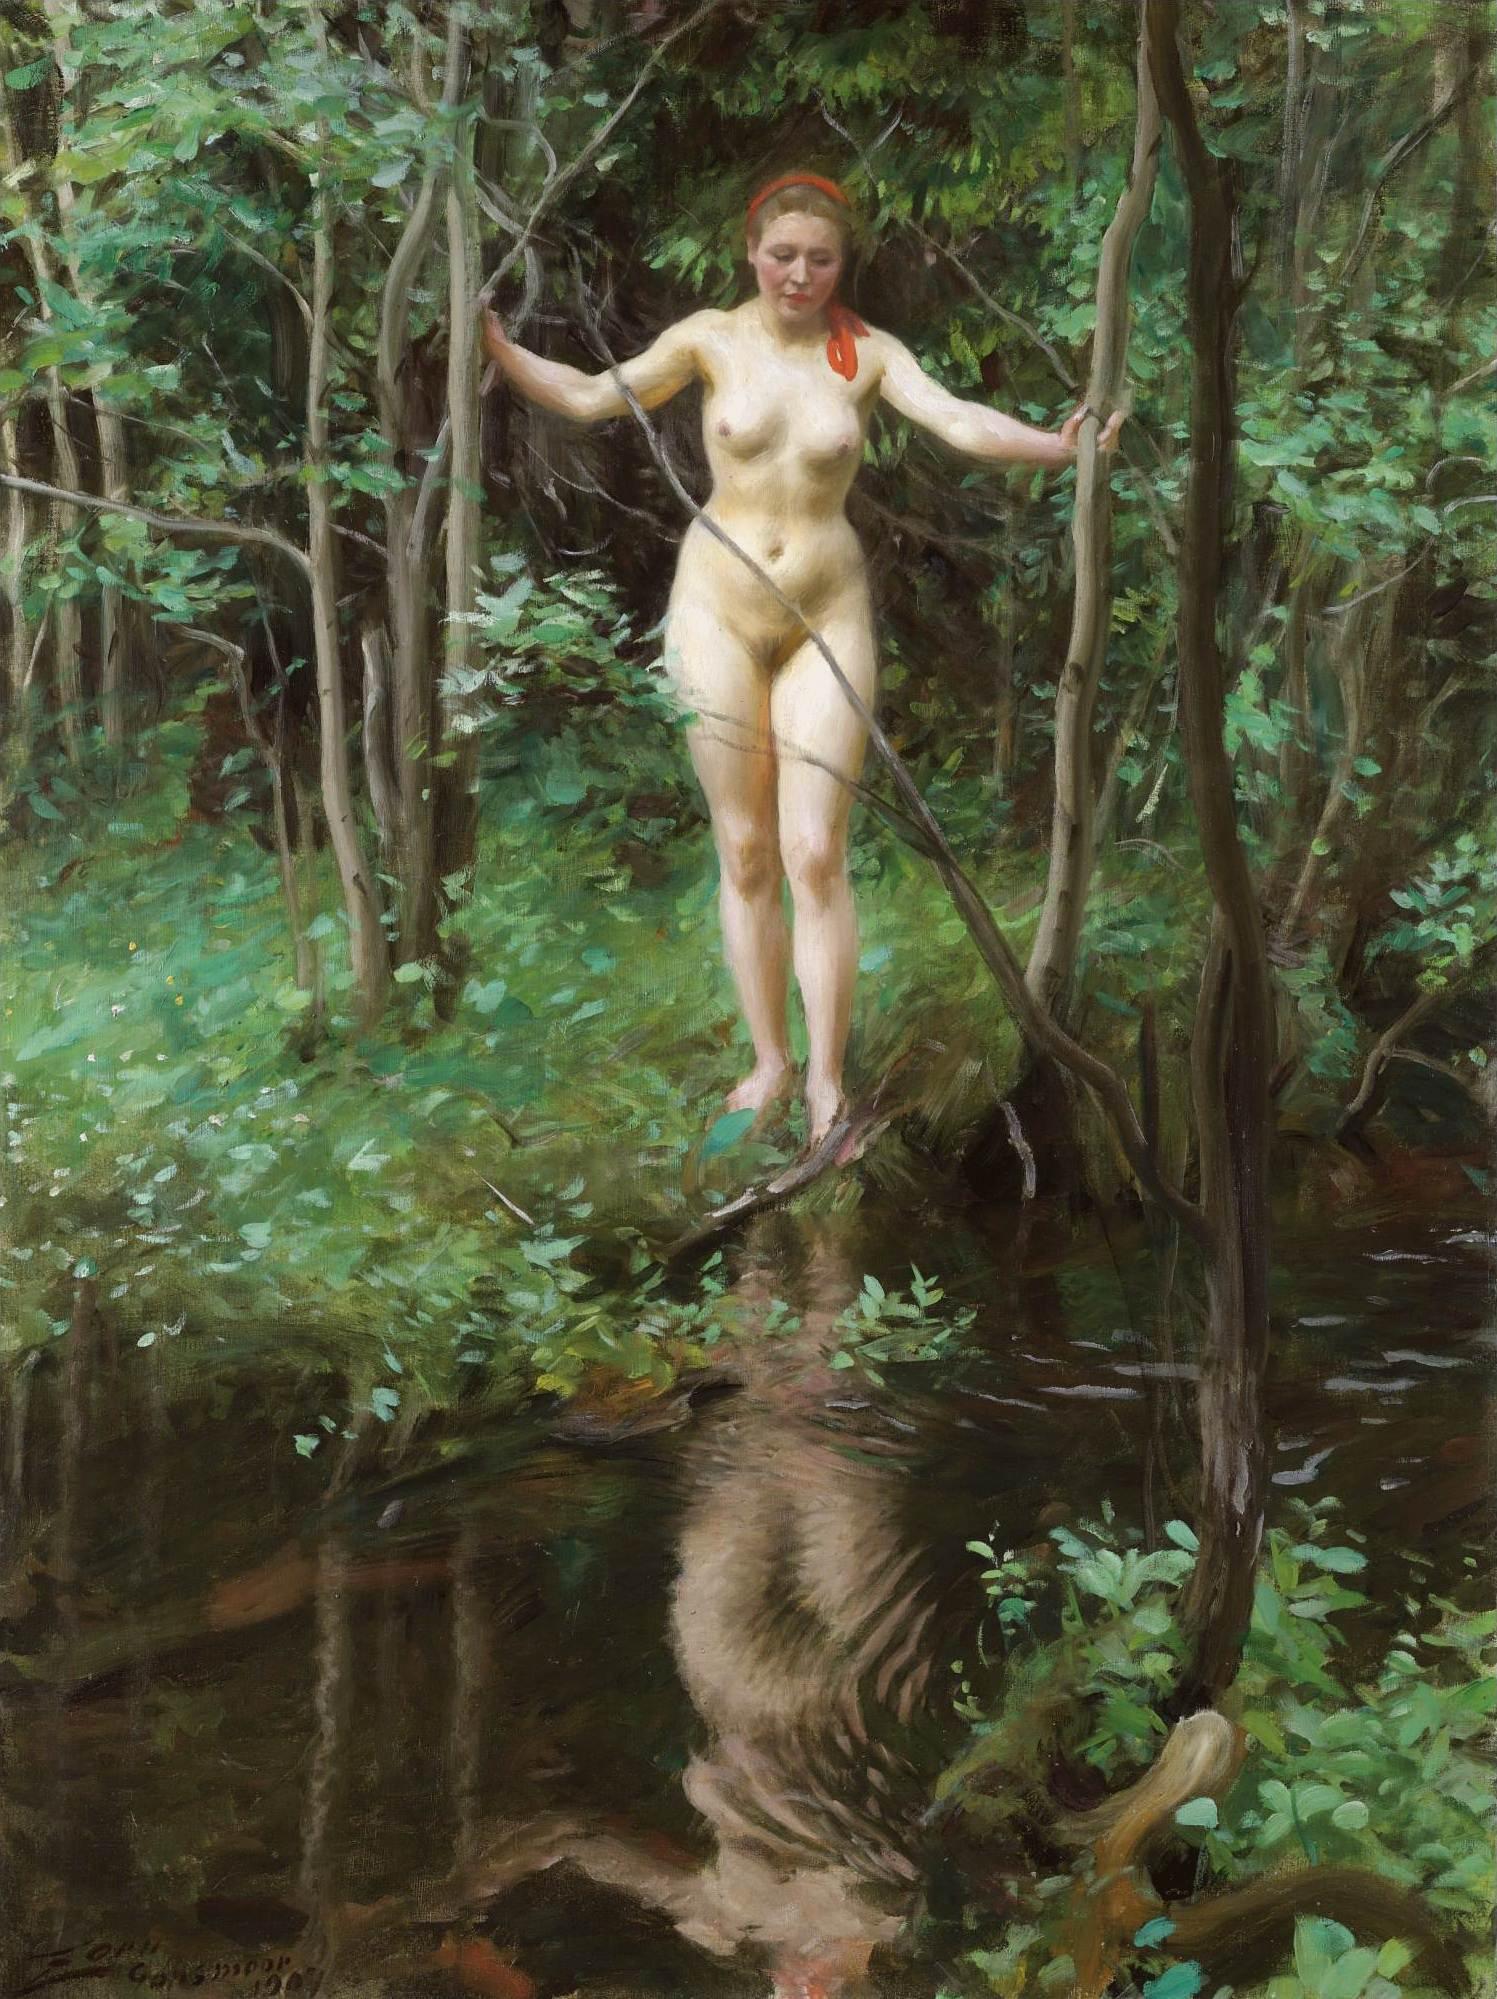 Anders Leonard Zorn. 1860-1920. Ингеборга. 1907, 120 х 91 см. Частная коллекция